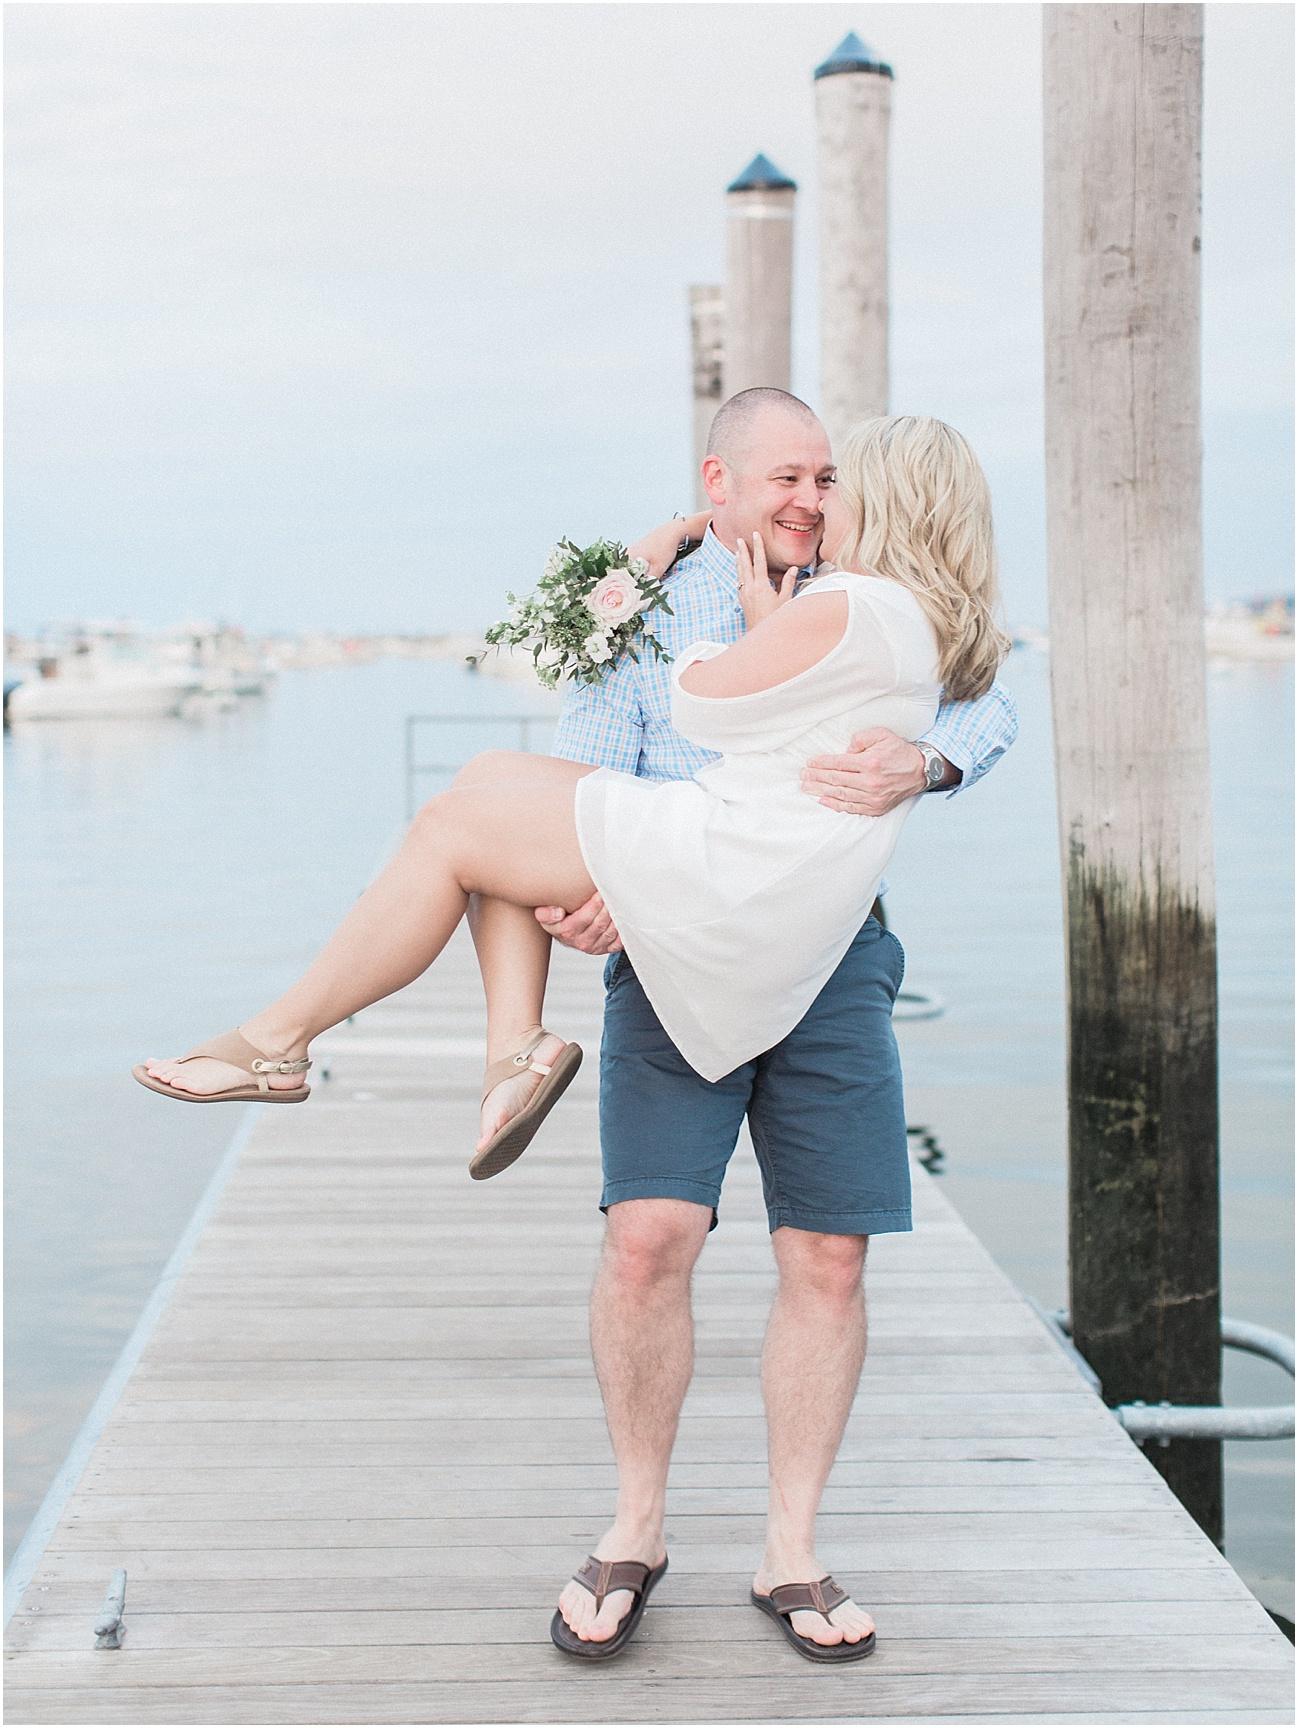 amy_erik_plymouth_brewster_gardens_jetty_champagne_cape_cod_boston_wedding_photographer_meredith_jane_photography_photo_0779.jpg